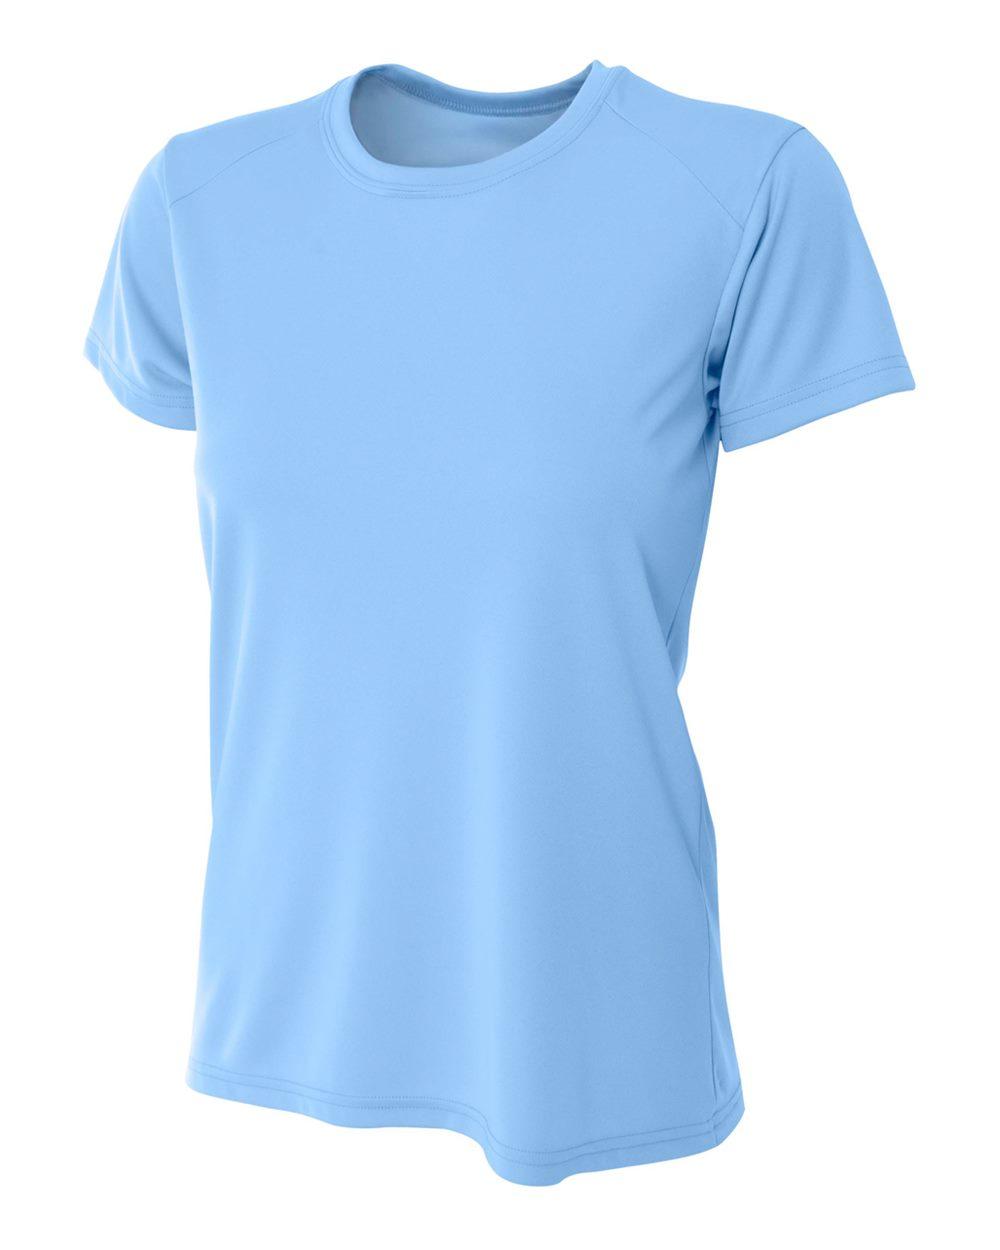 womens-polo-mwicking-light-blue.jpg